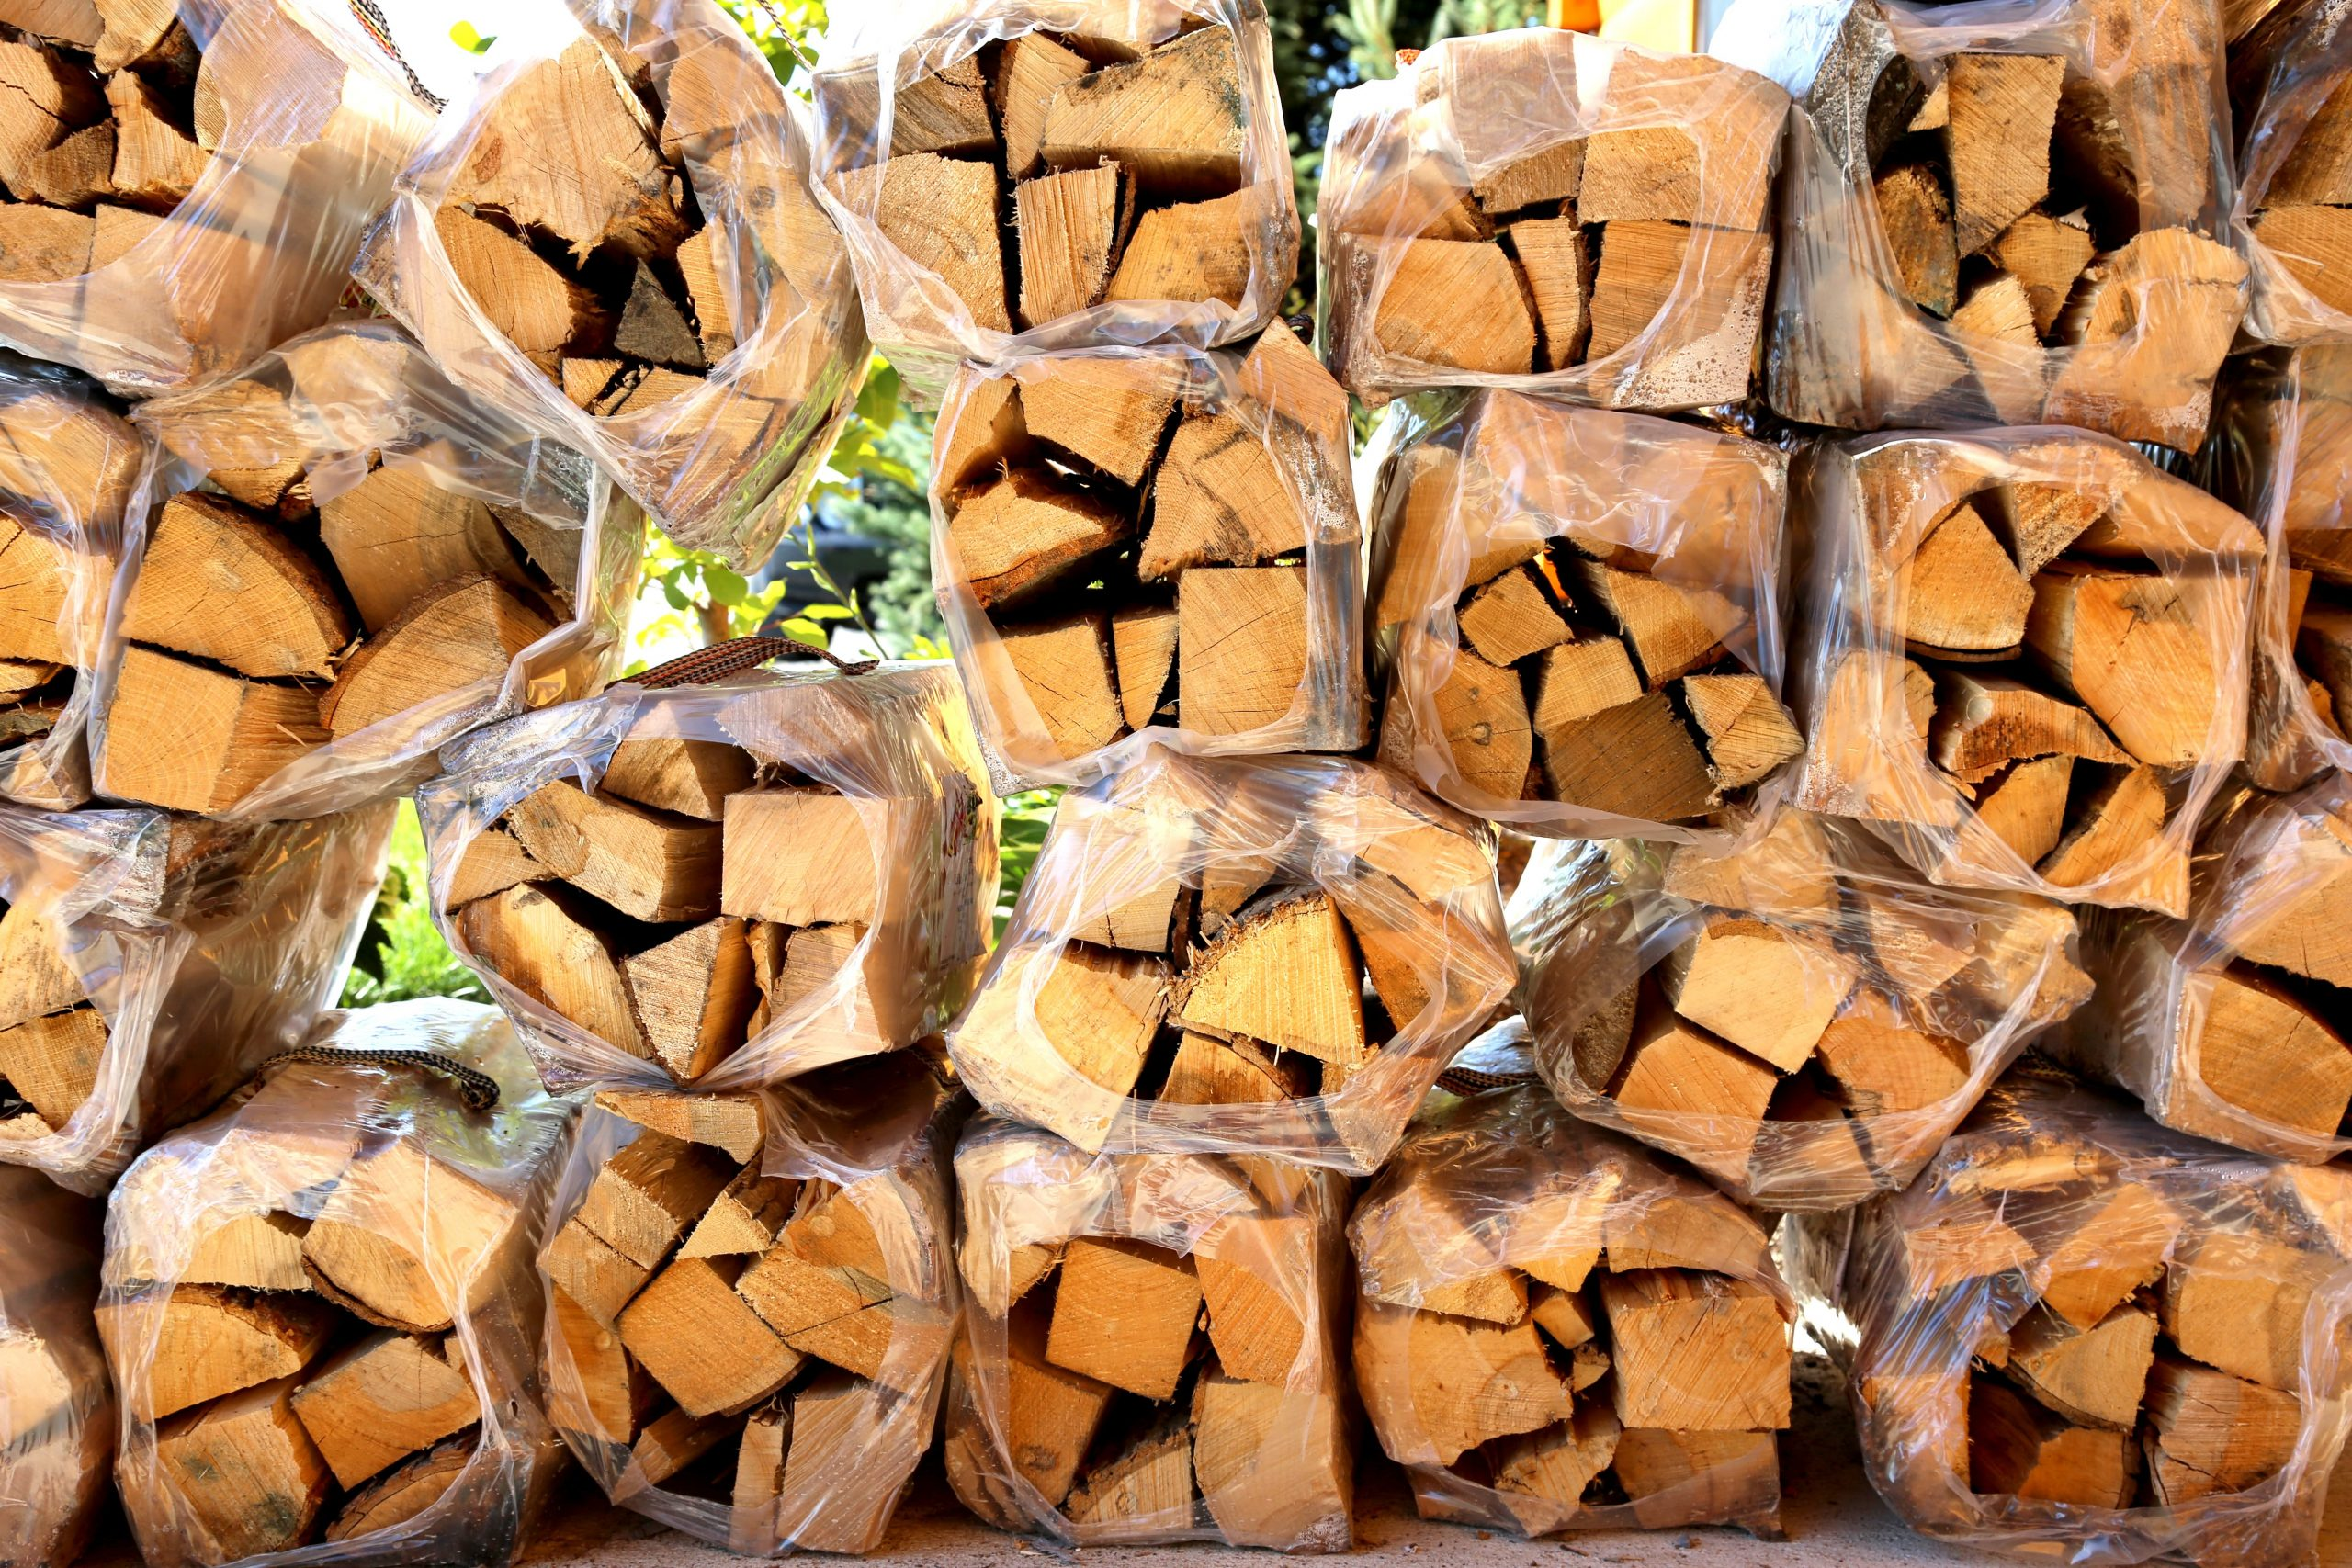 bundles of firewood